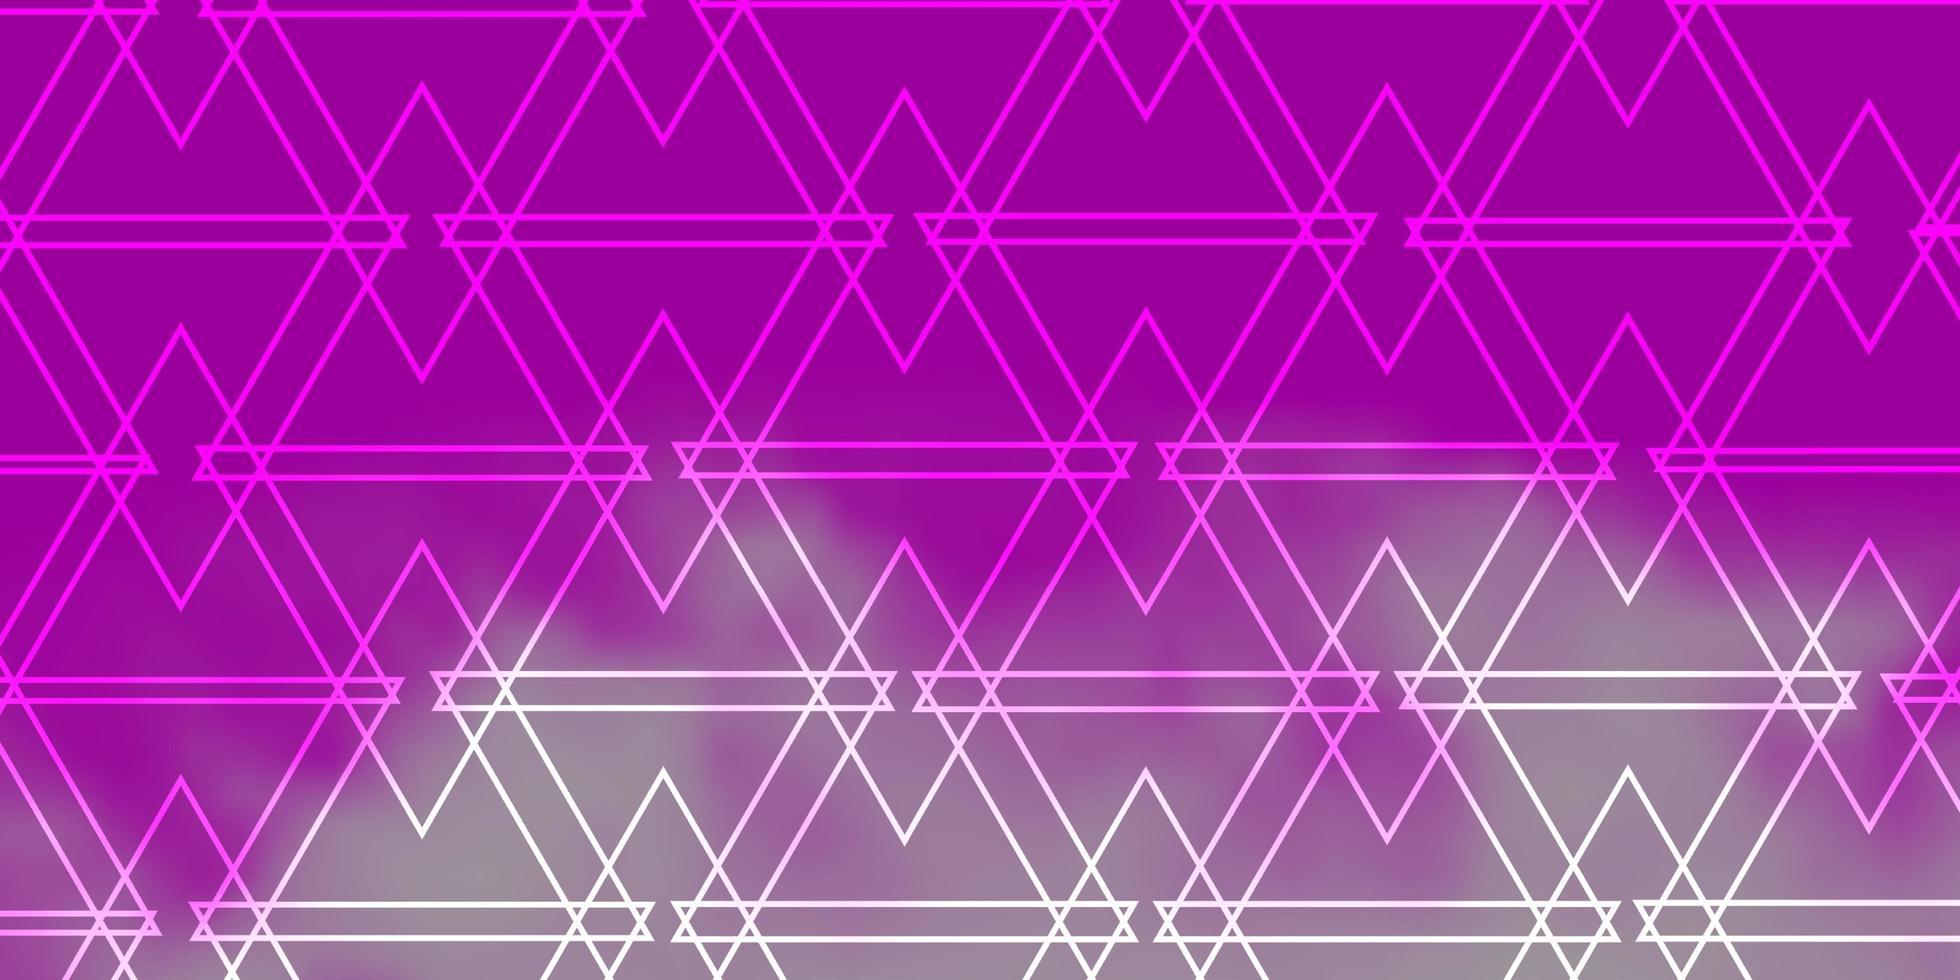 rosa mönster med polygonal stil. vektor